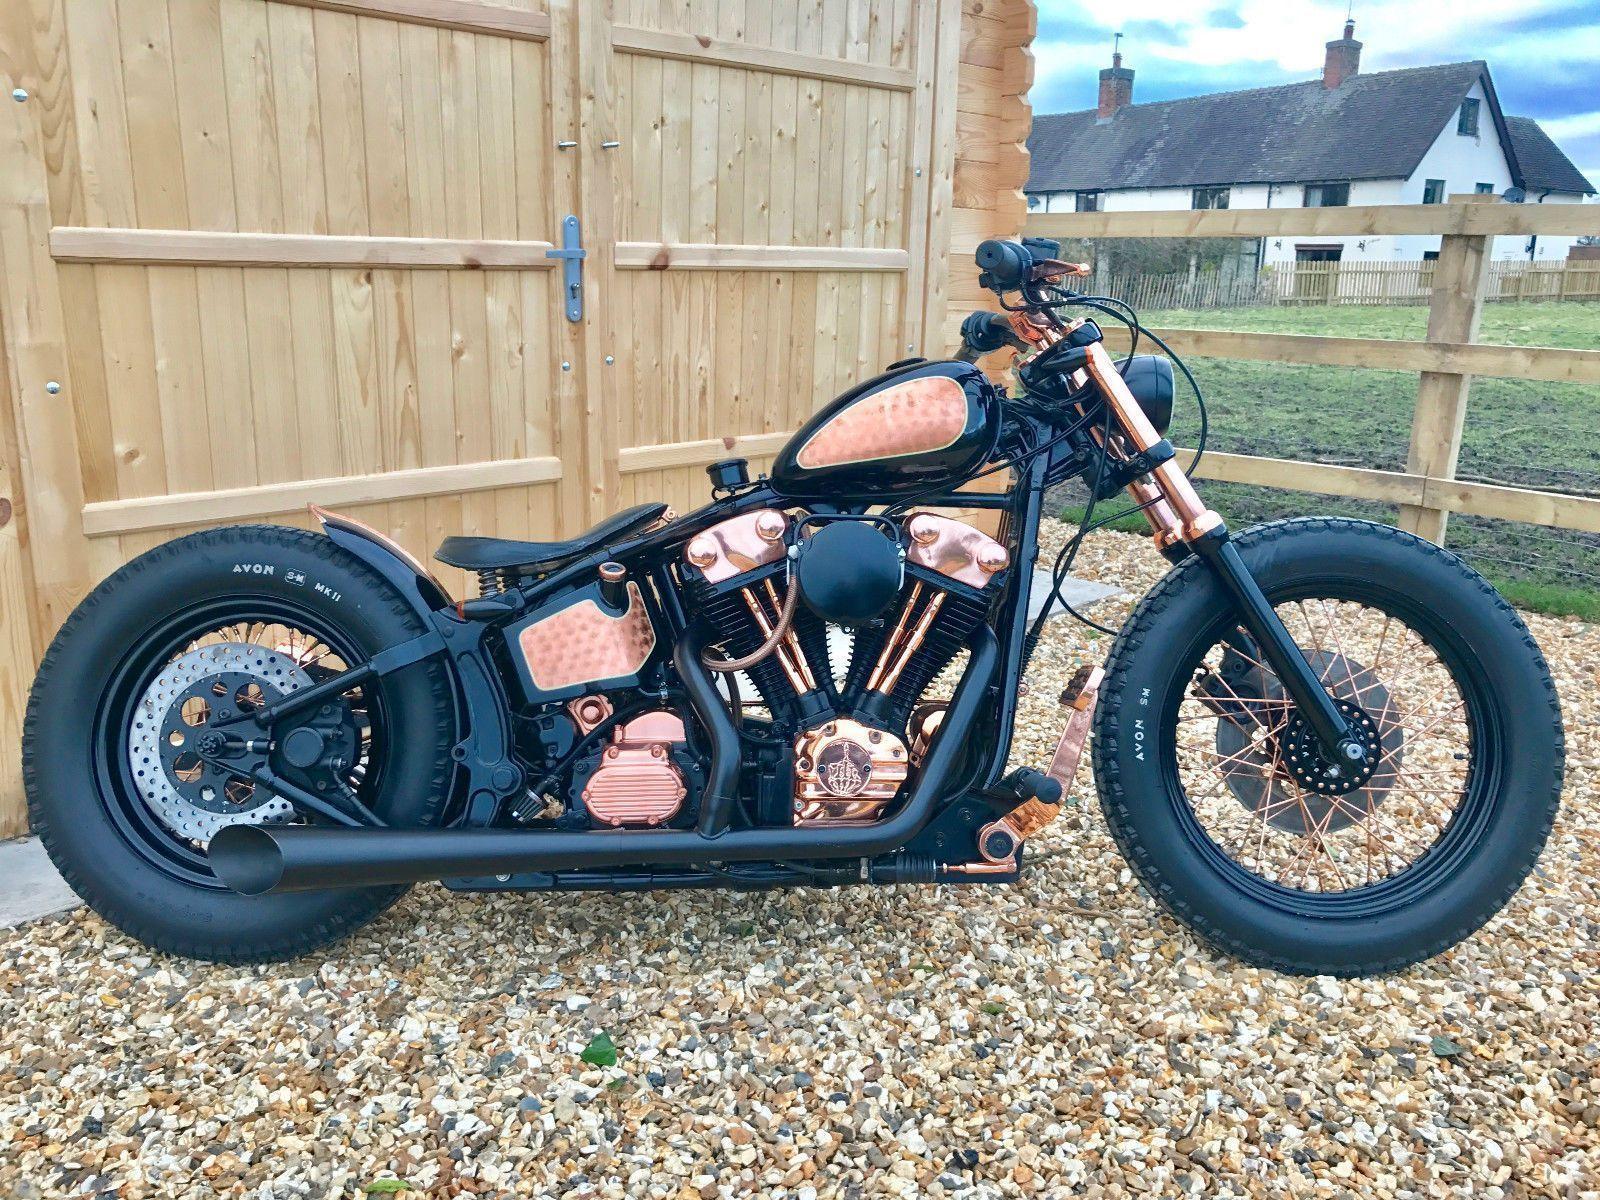 Bobber Wiring Harness Ebay Diagram Harley Chopper Sold Davidson Softail Custom Rh Pinterest Com Xs650